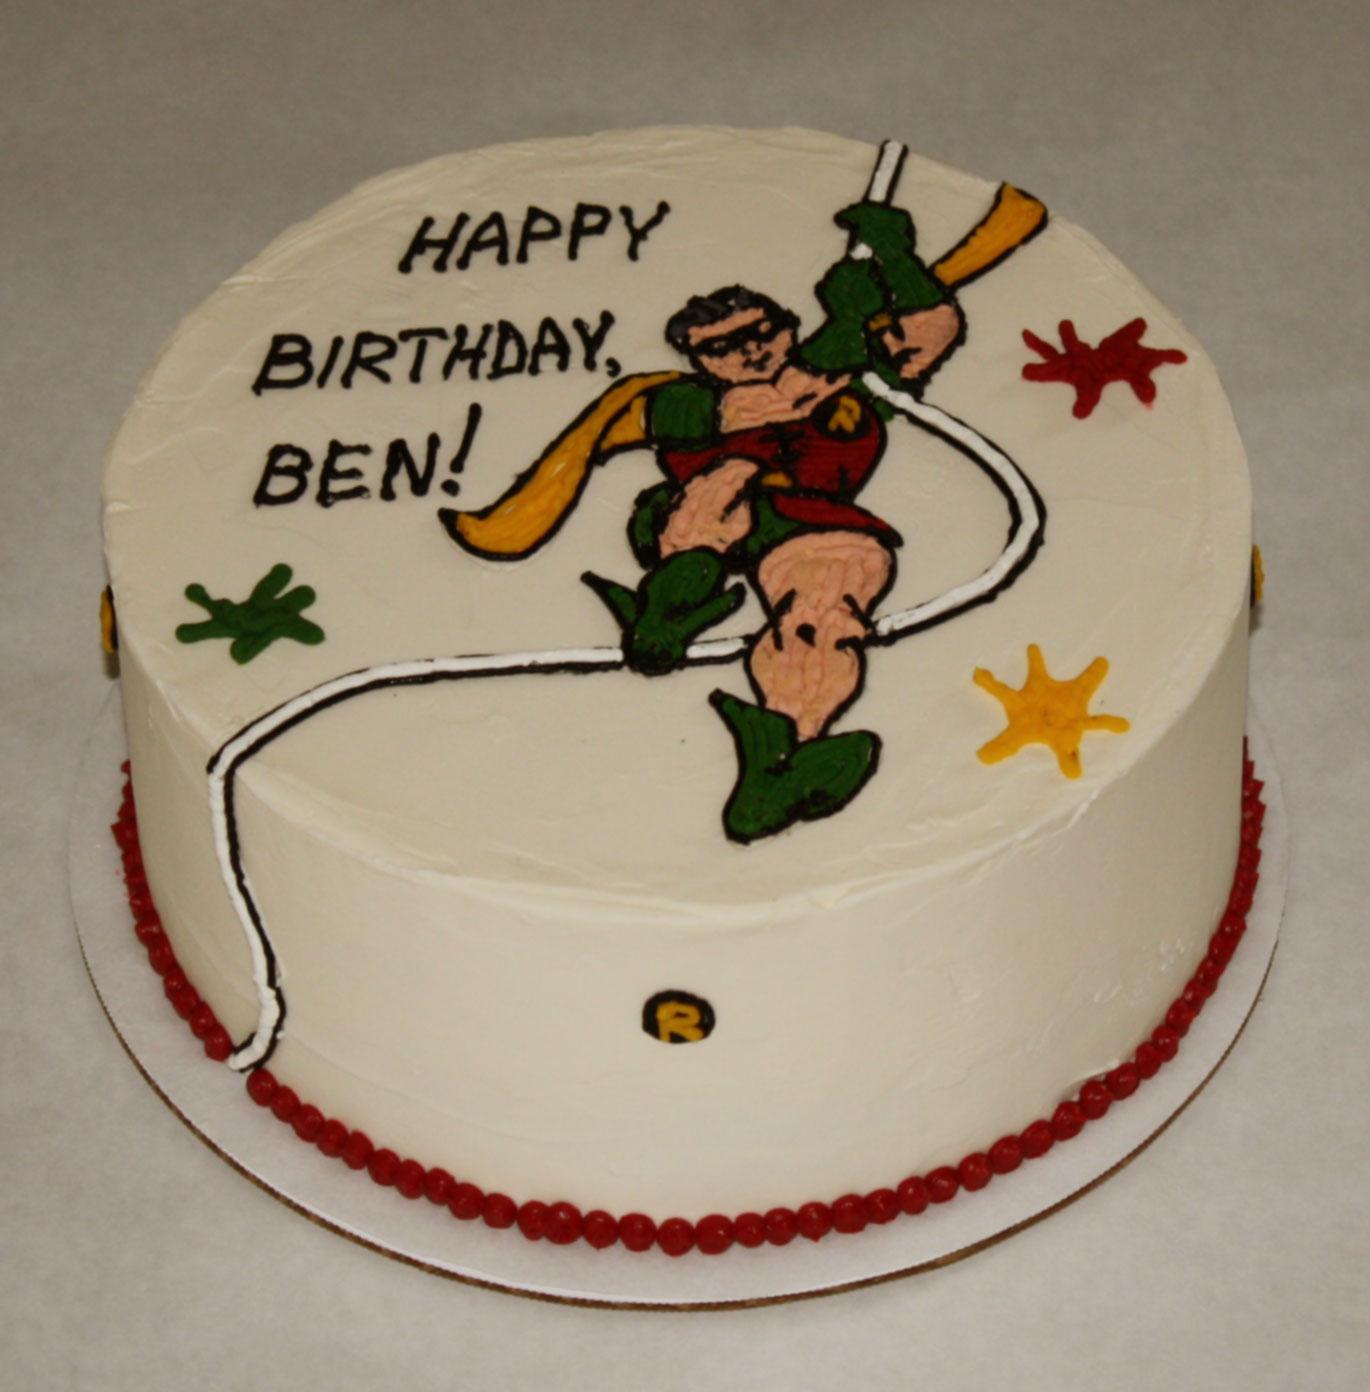 Holy Birthday, Batman!